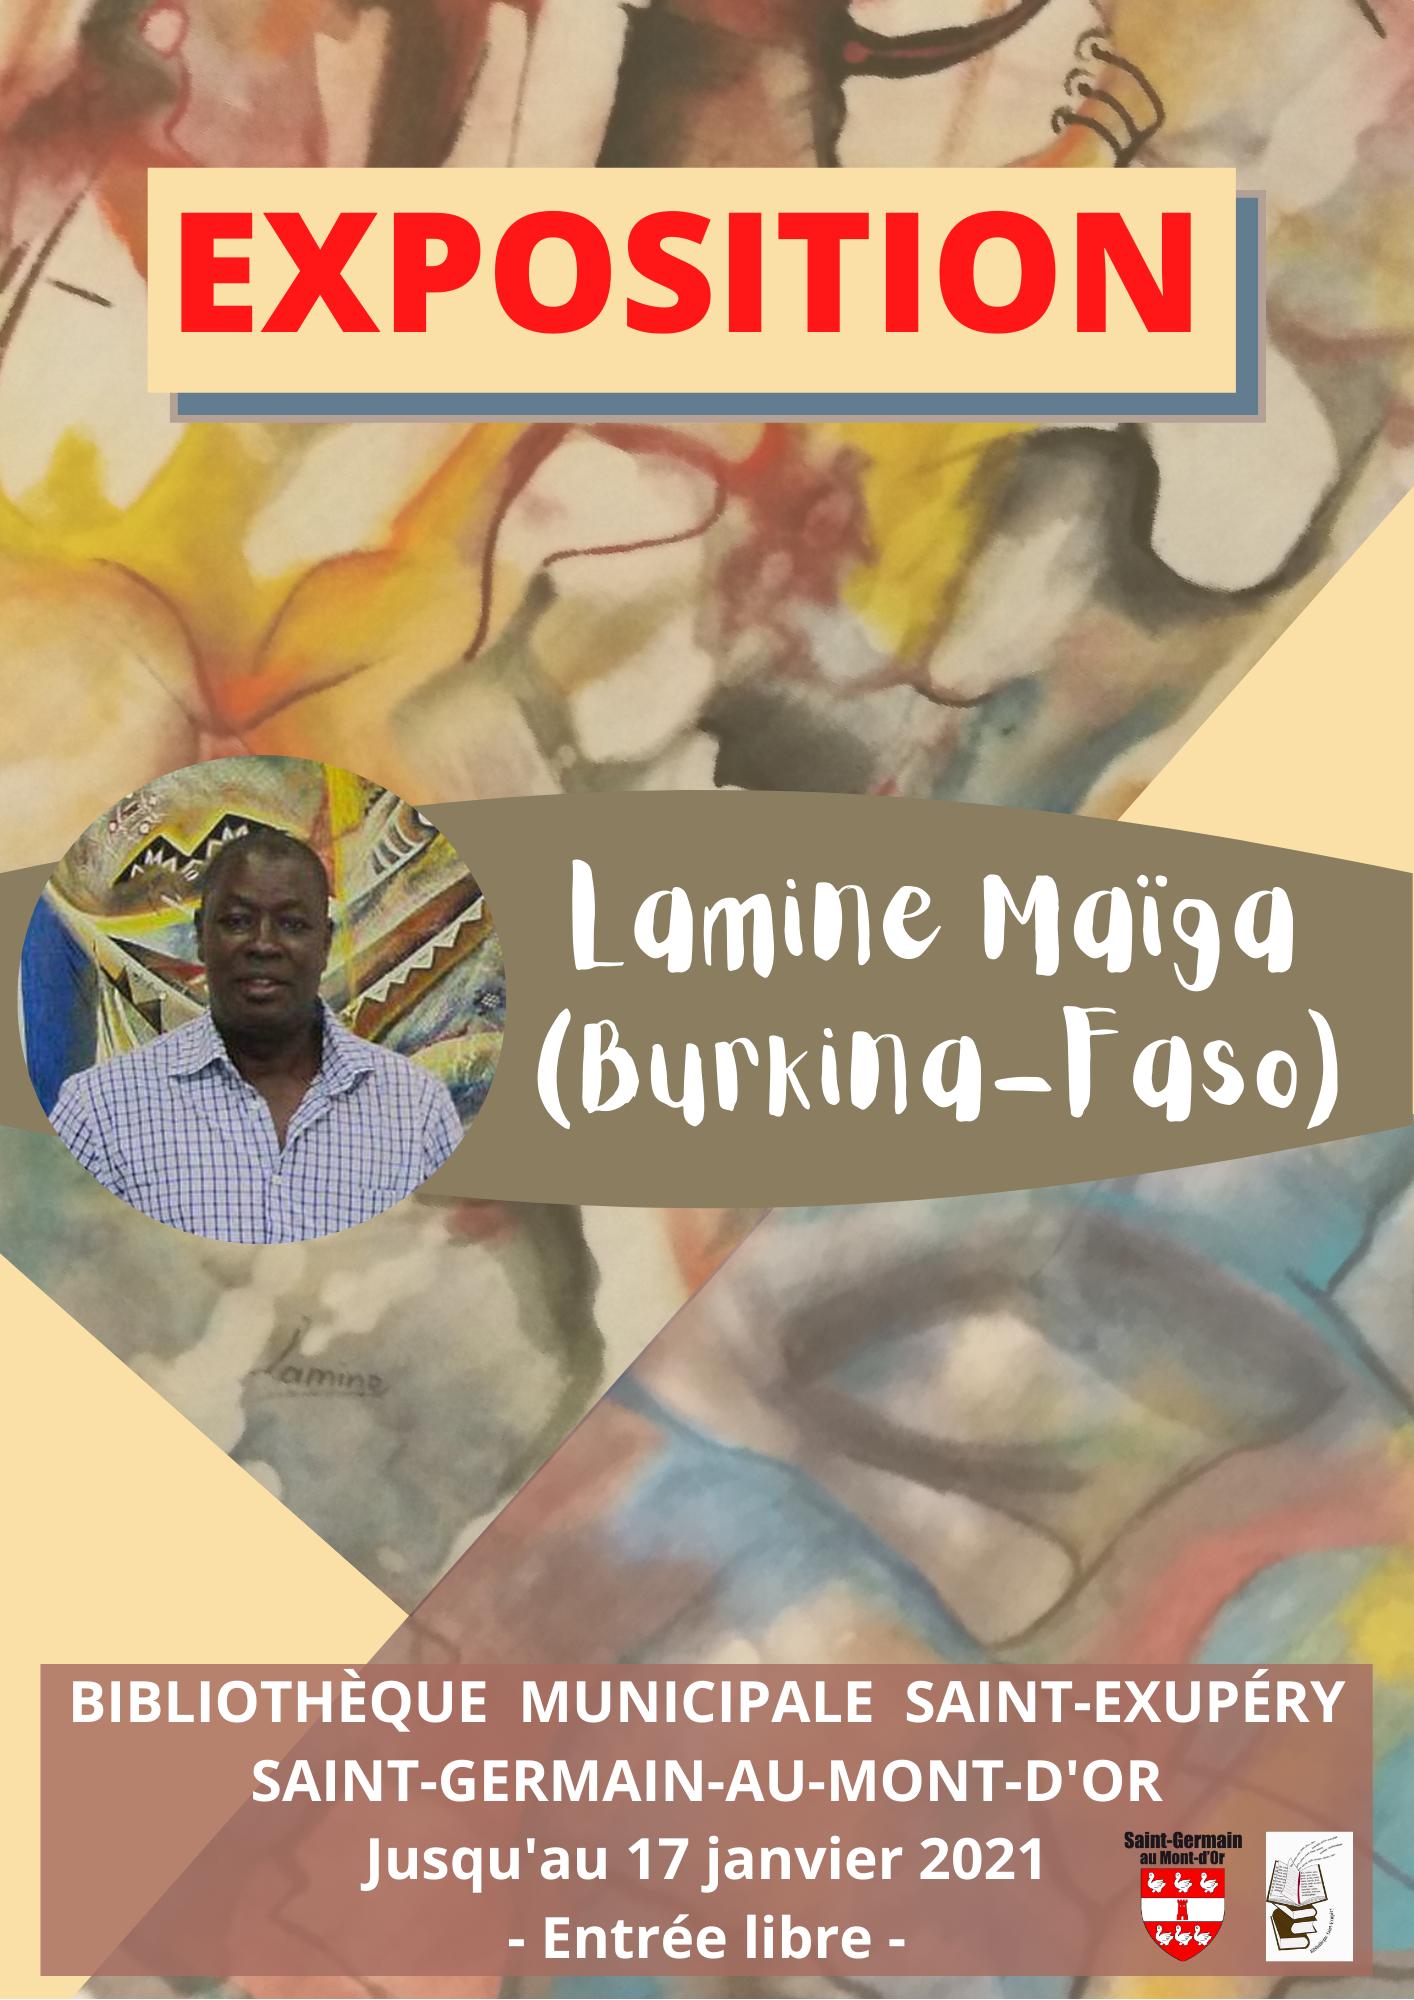 Exposition de Lamine Maïga (Burkina Faso) @ Bibliothèque